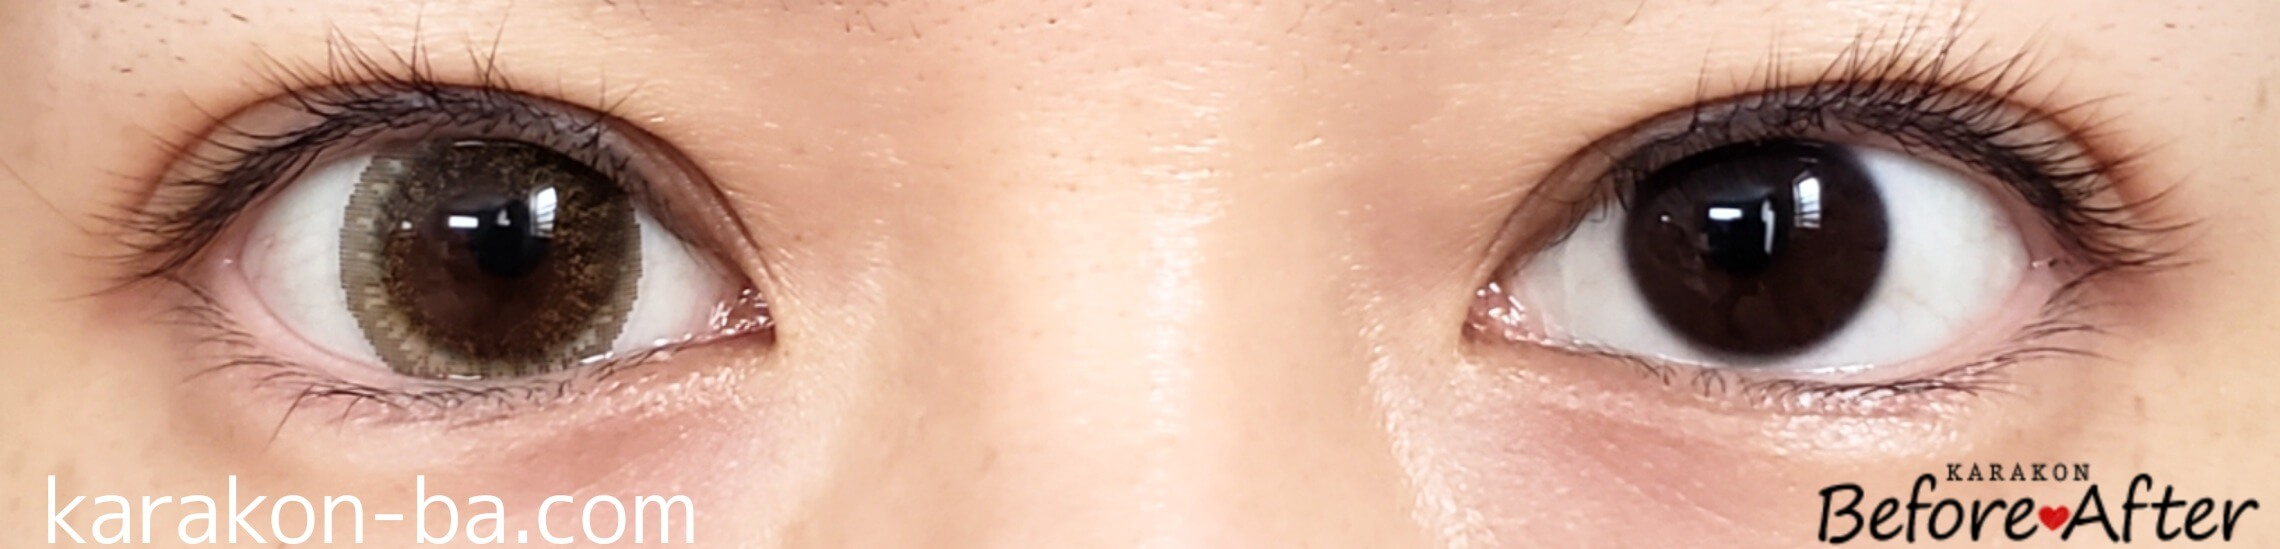 No.14ヘーゼルのカラコン装着画像/裸眼と比較